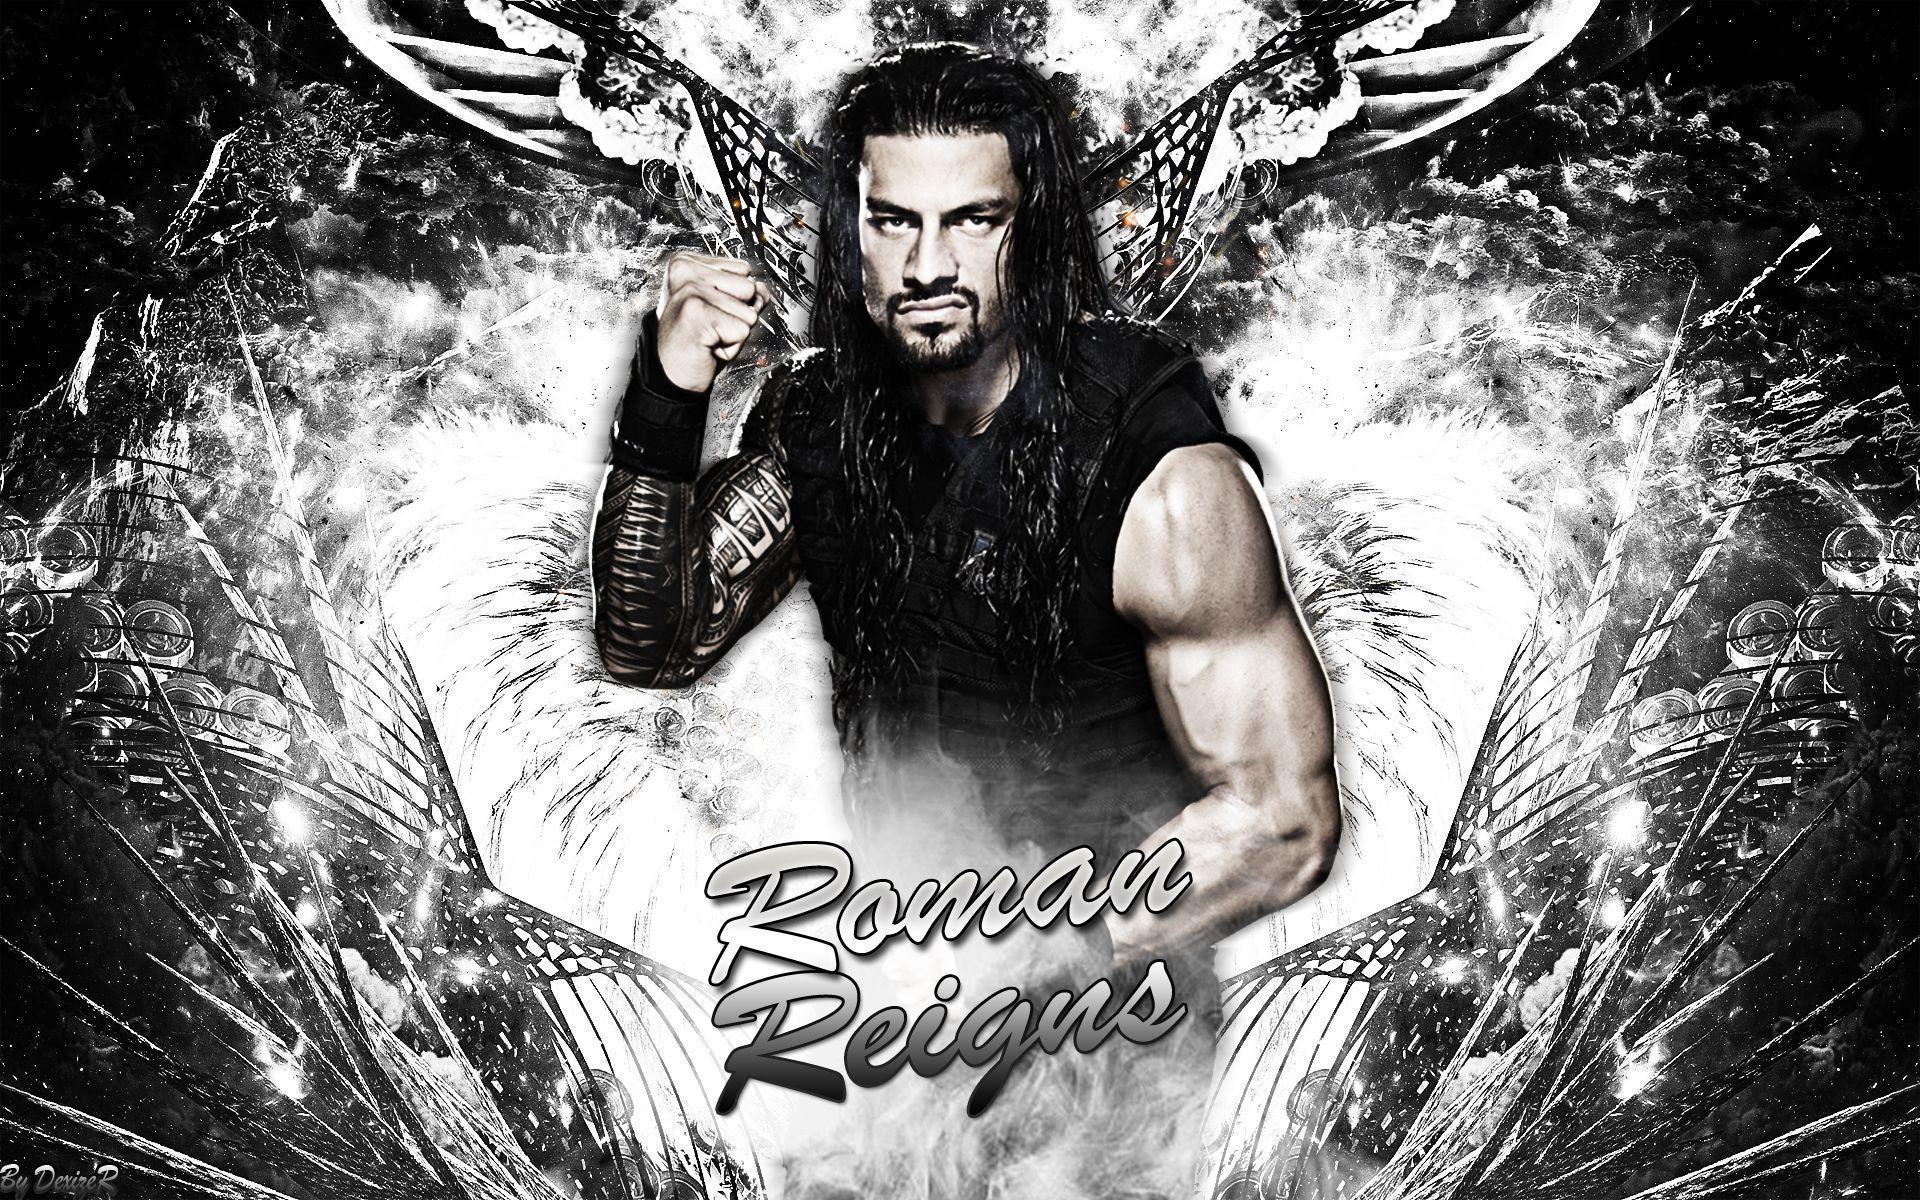 WWE Roman Reigns Wallpaper by Phenomenon-Des on DeviantArt